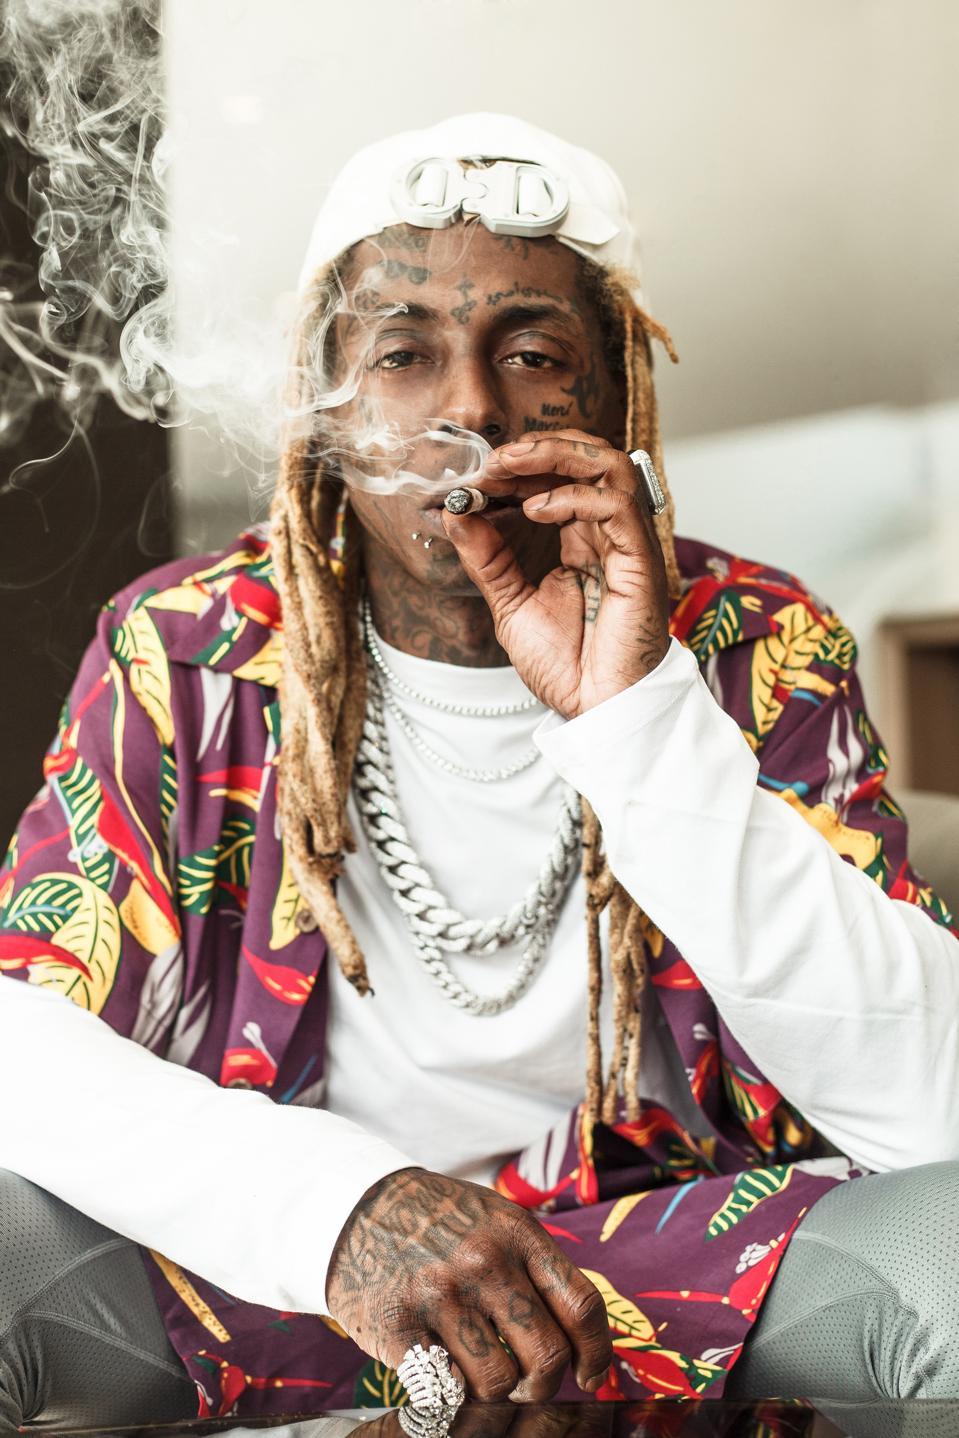 Lil Wayne + GKUA Ultra Premium